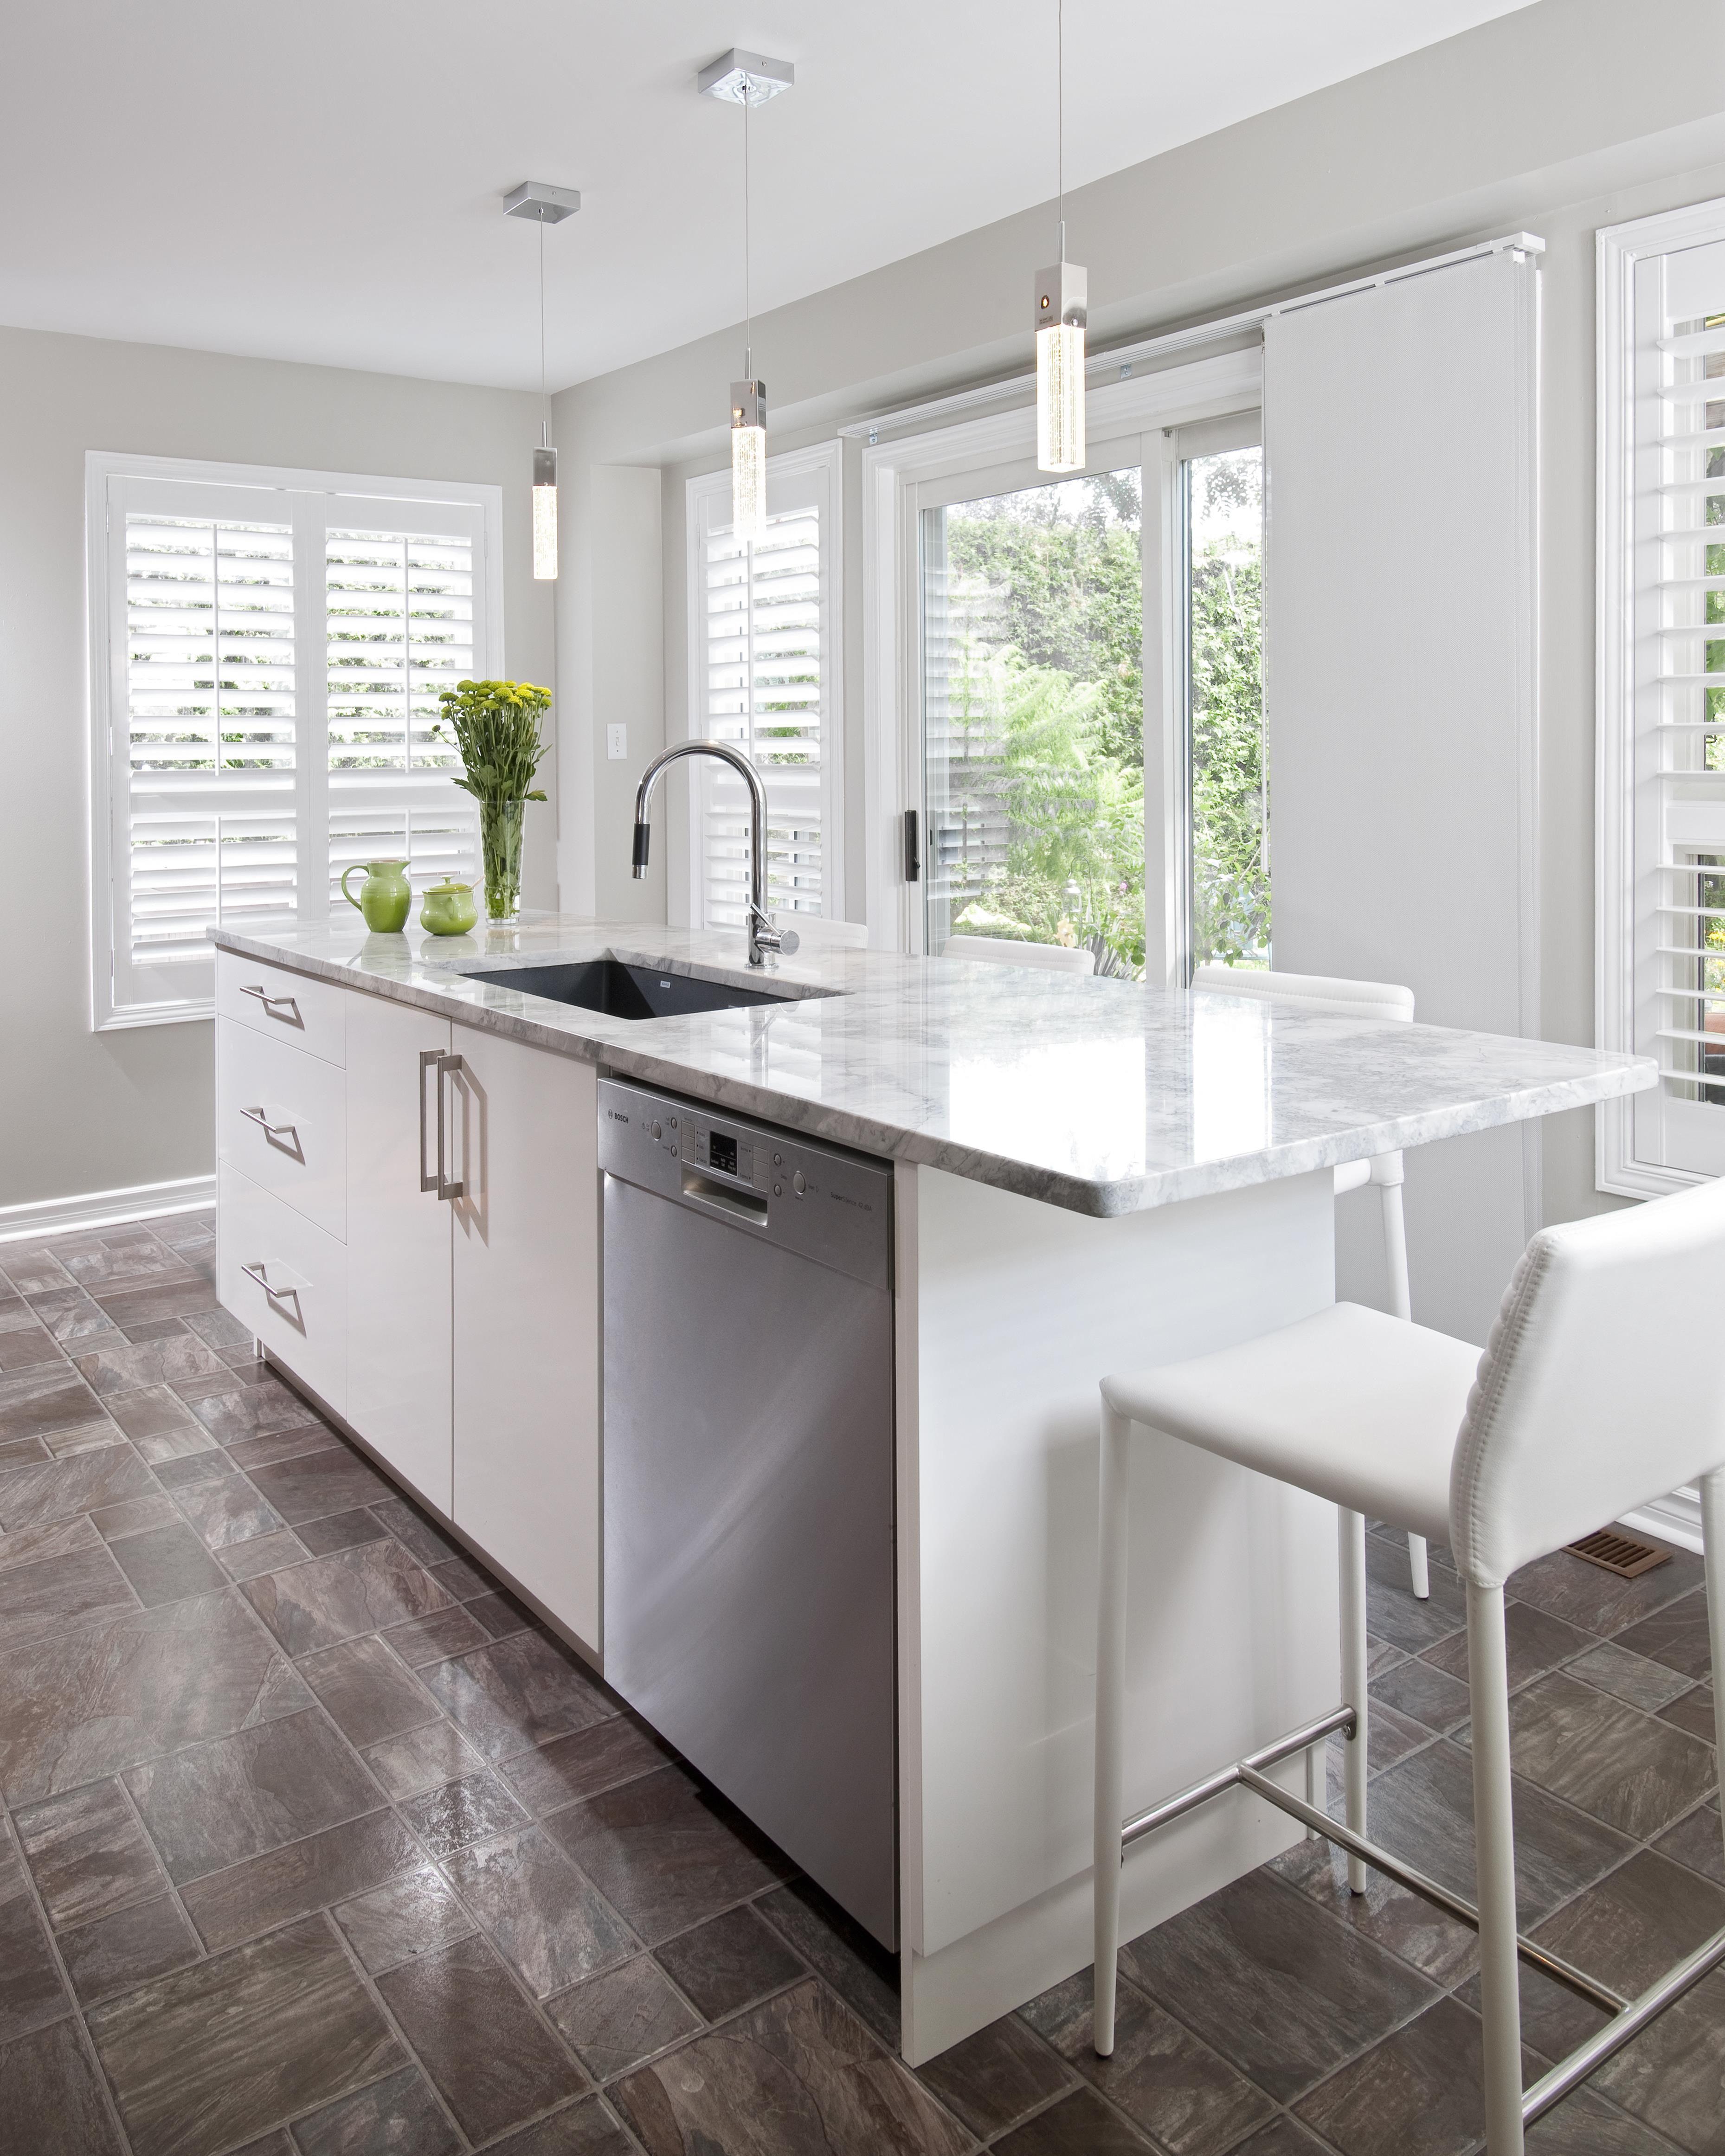 Lighting Fixtures For Kitchens: ET2 E22761-89PC Polished Chrome Fizz III 1 Light LED Mini